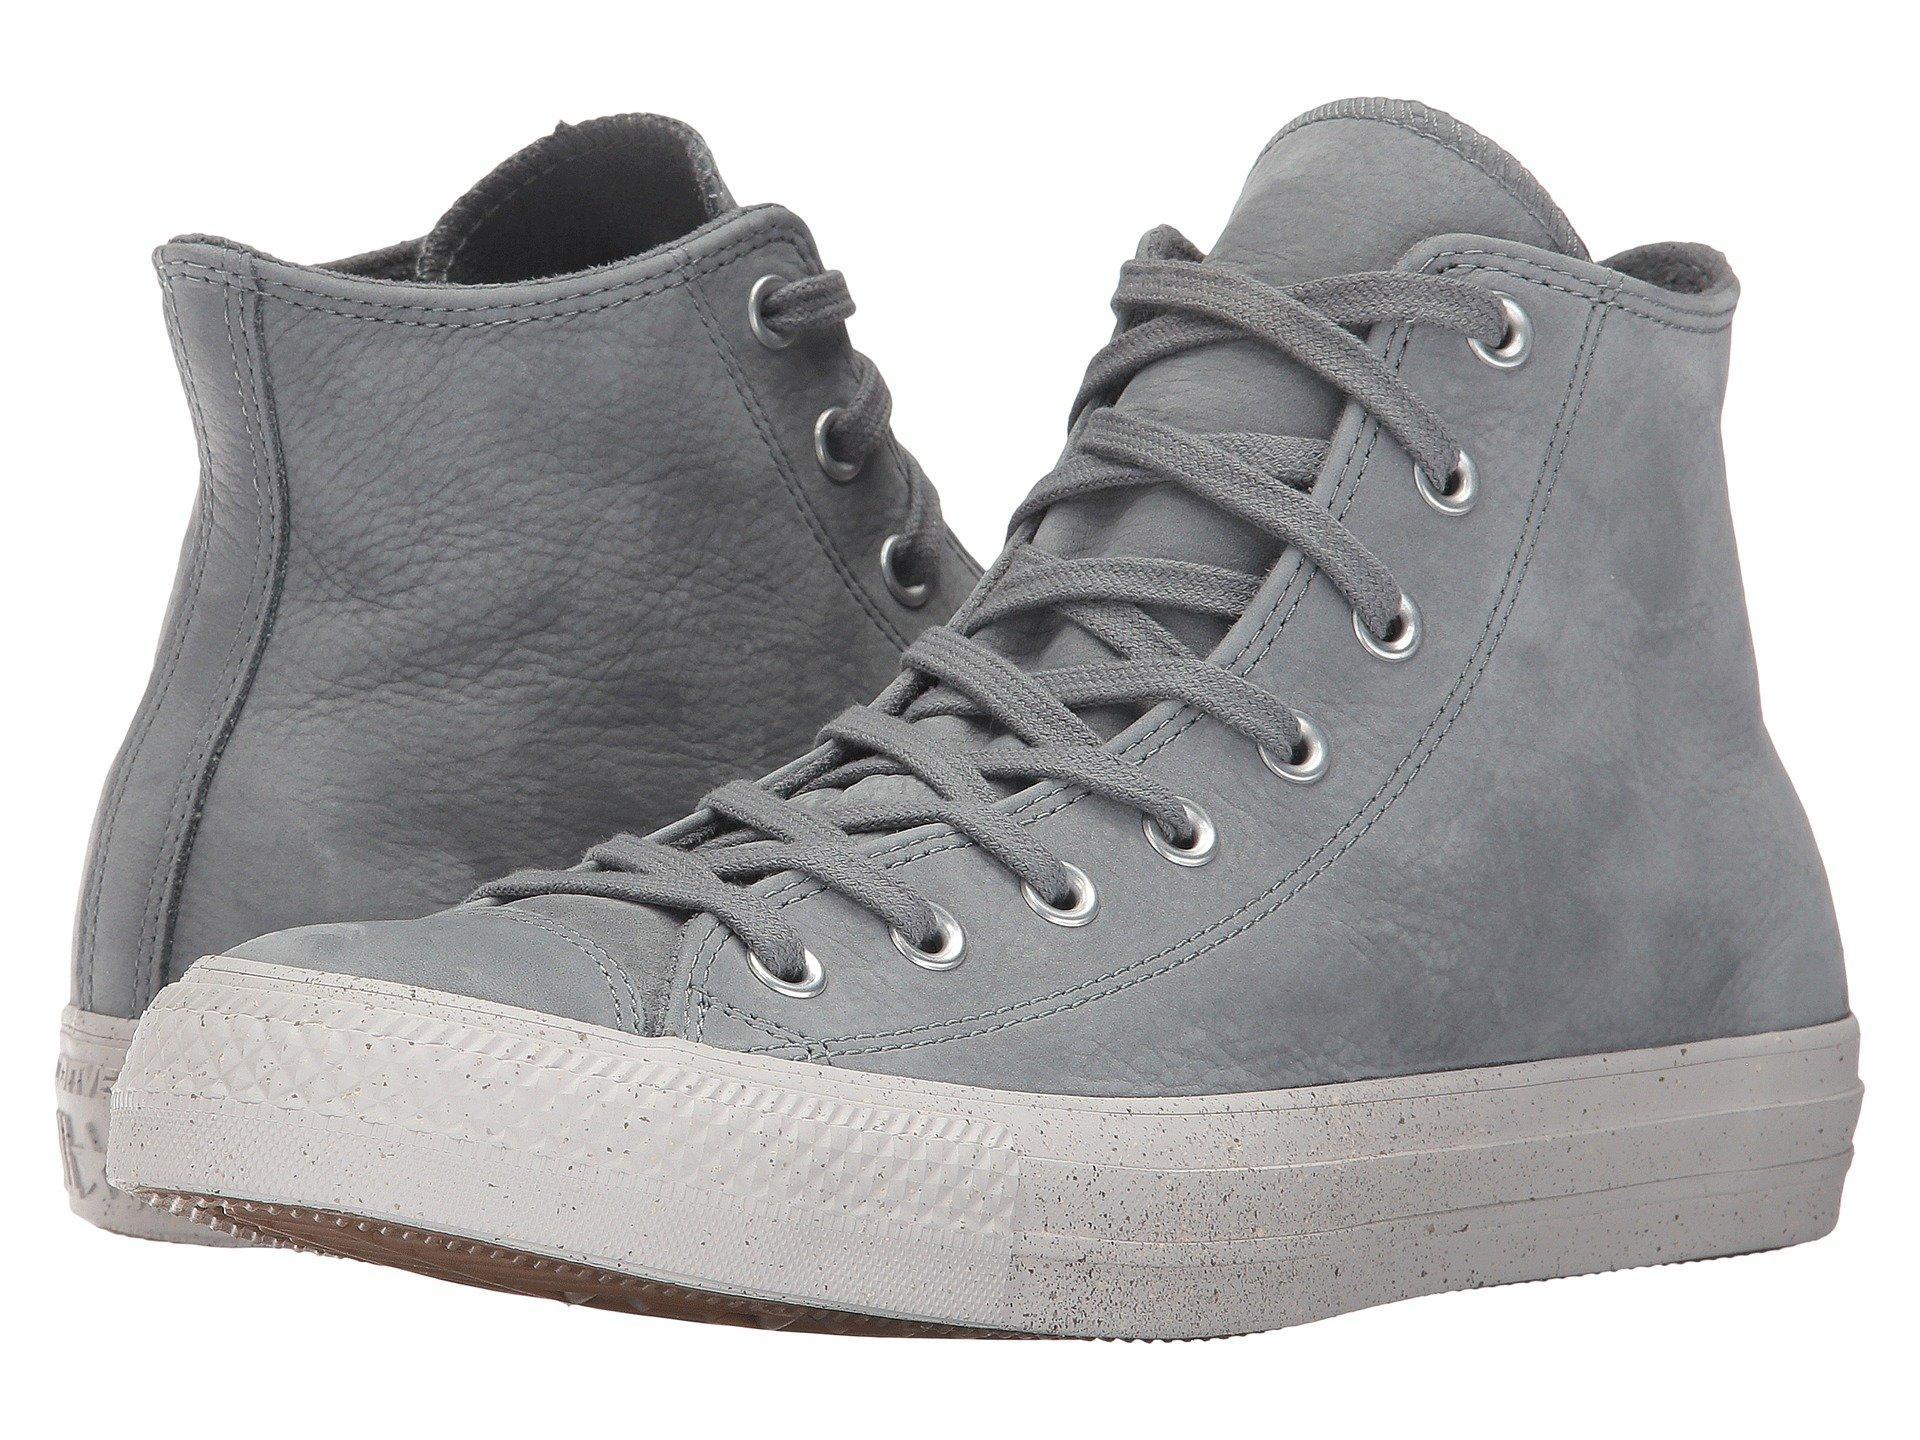 9cef42b7075673 Converse Chuck Taylor All Star Nubuck Hi In Cool Grey Malted Pale Putty